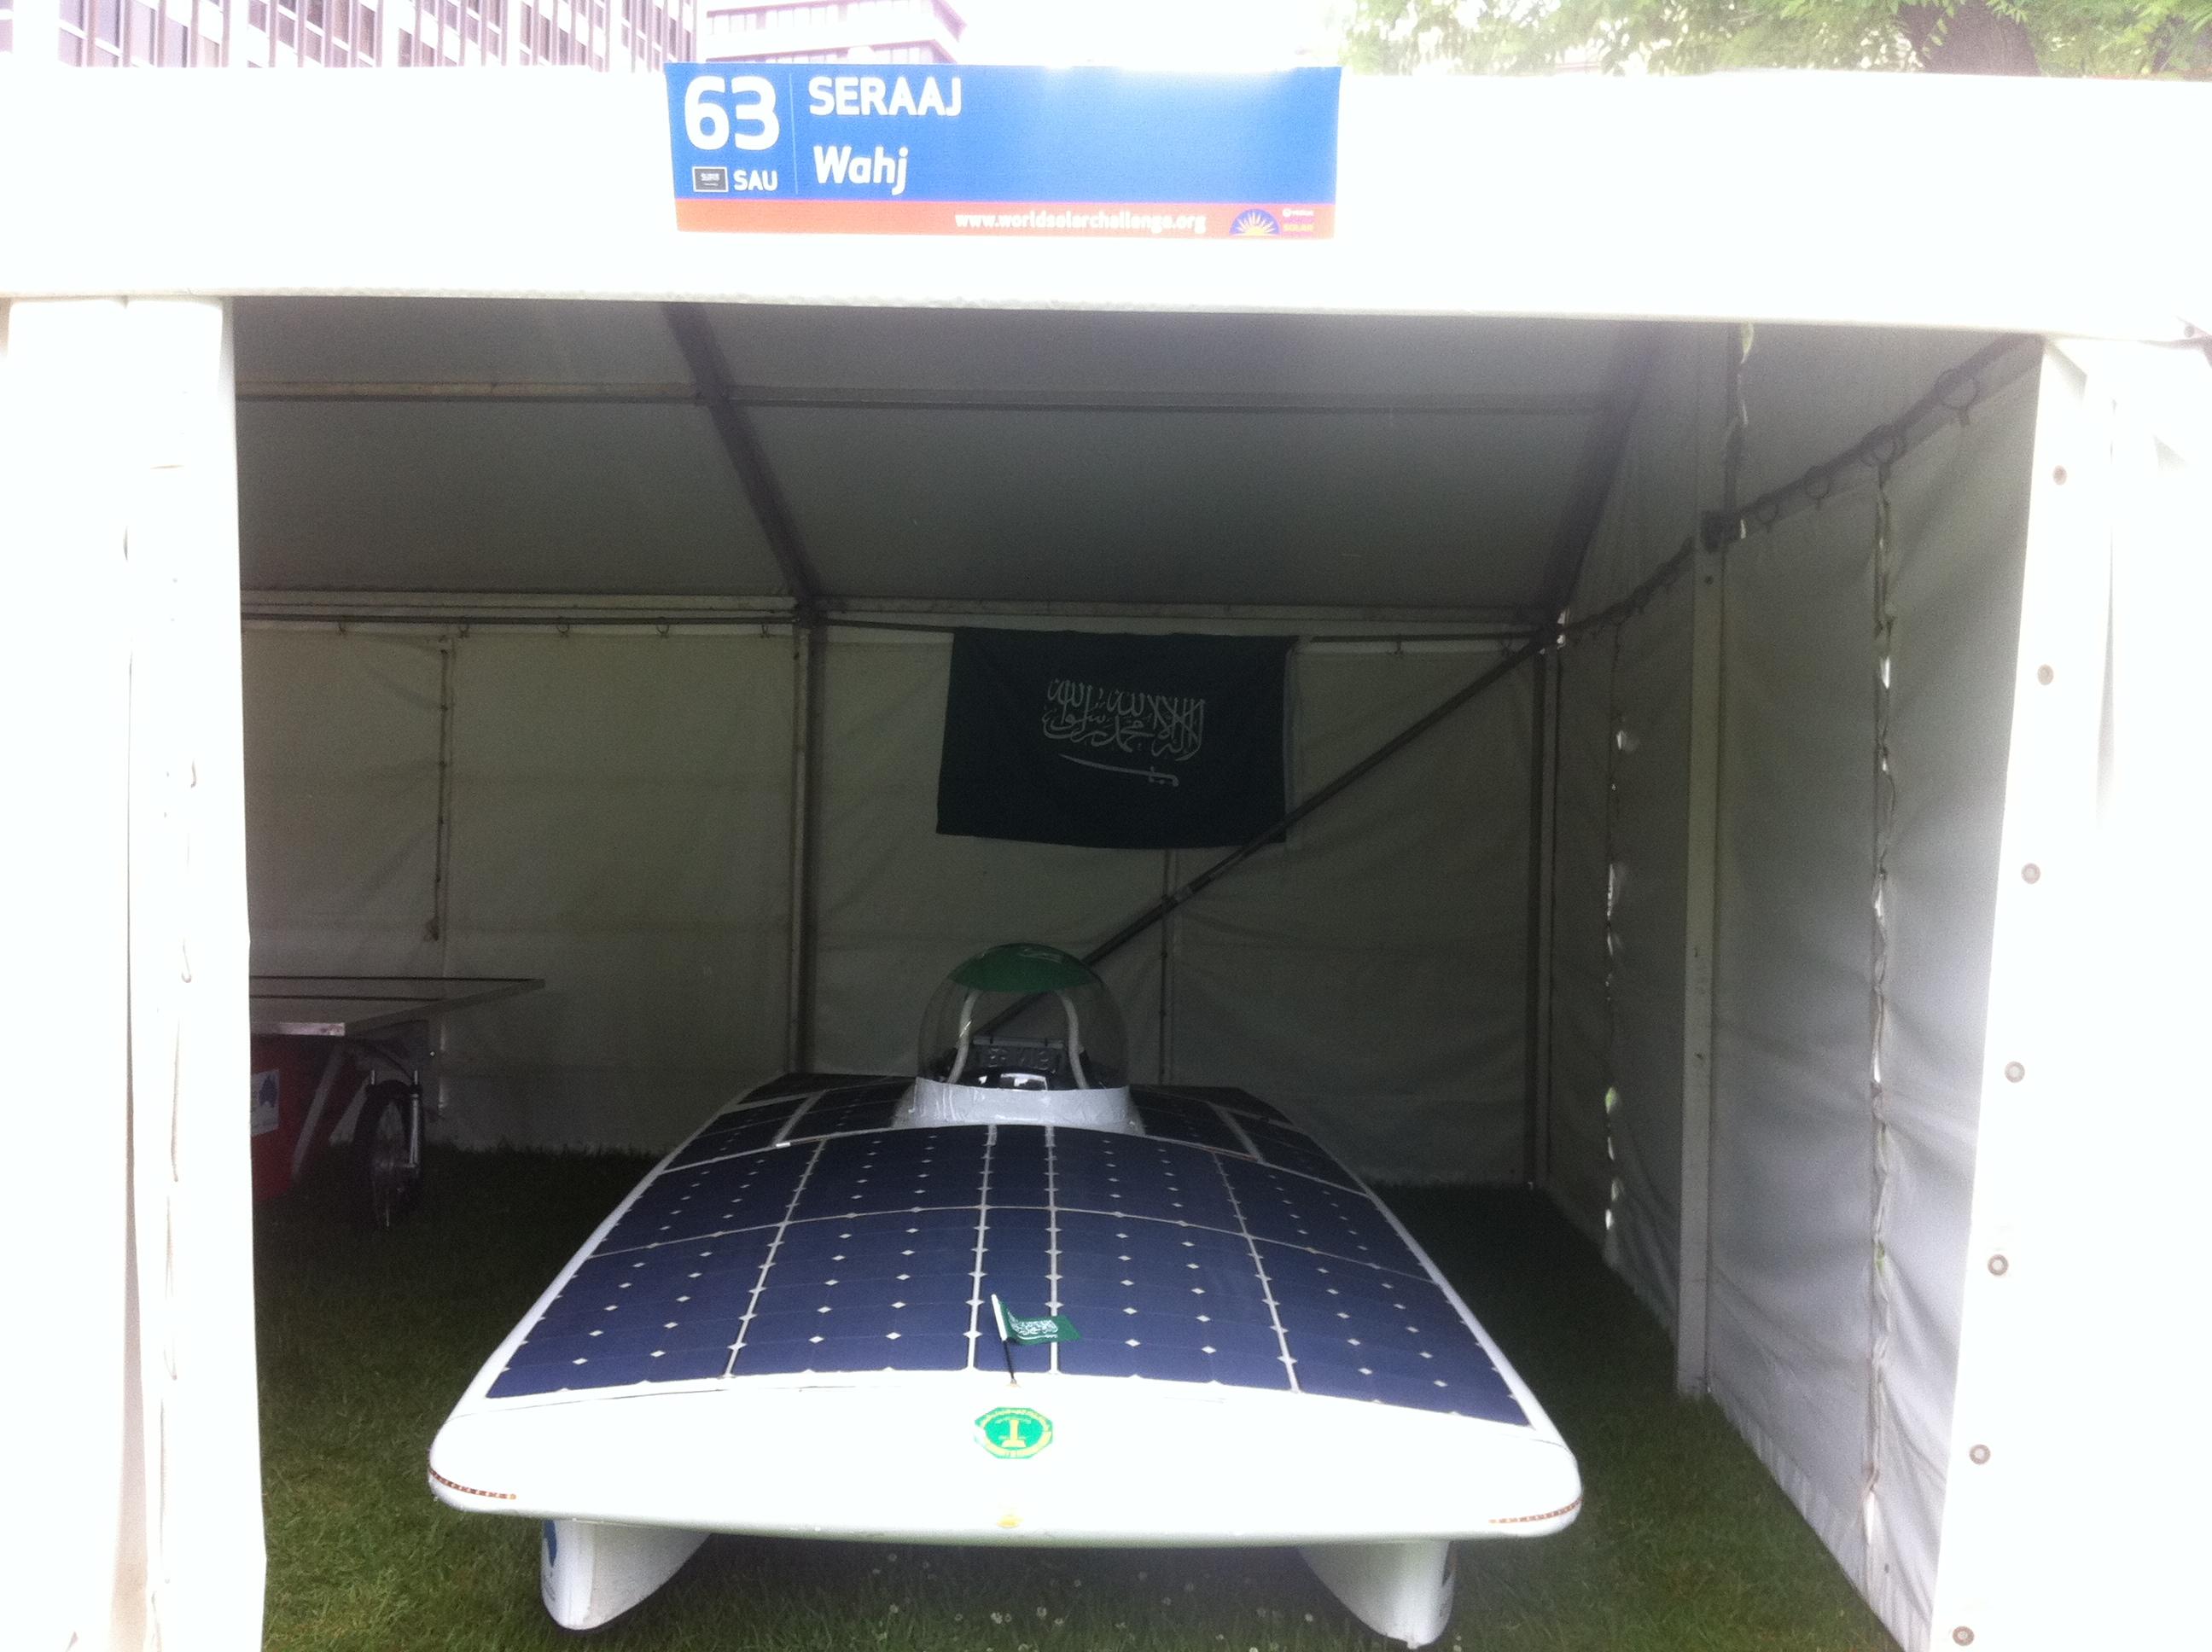 Seraaj Solar Car Team's Wahj (meaning glow) of The Kingdom of Saudi Arabia